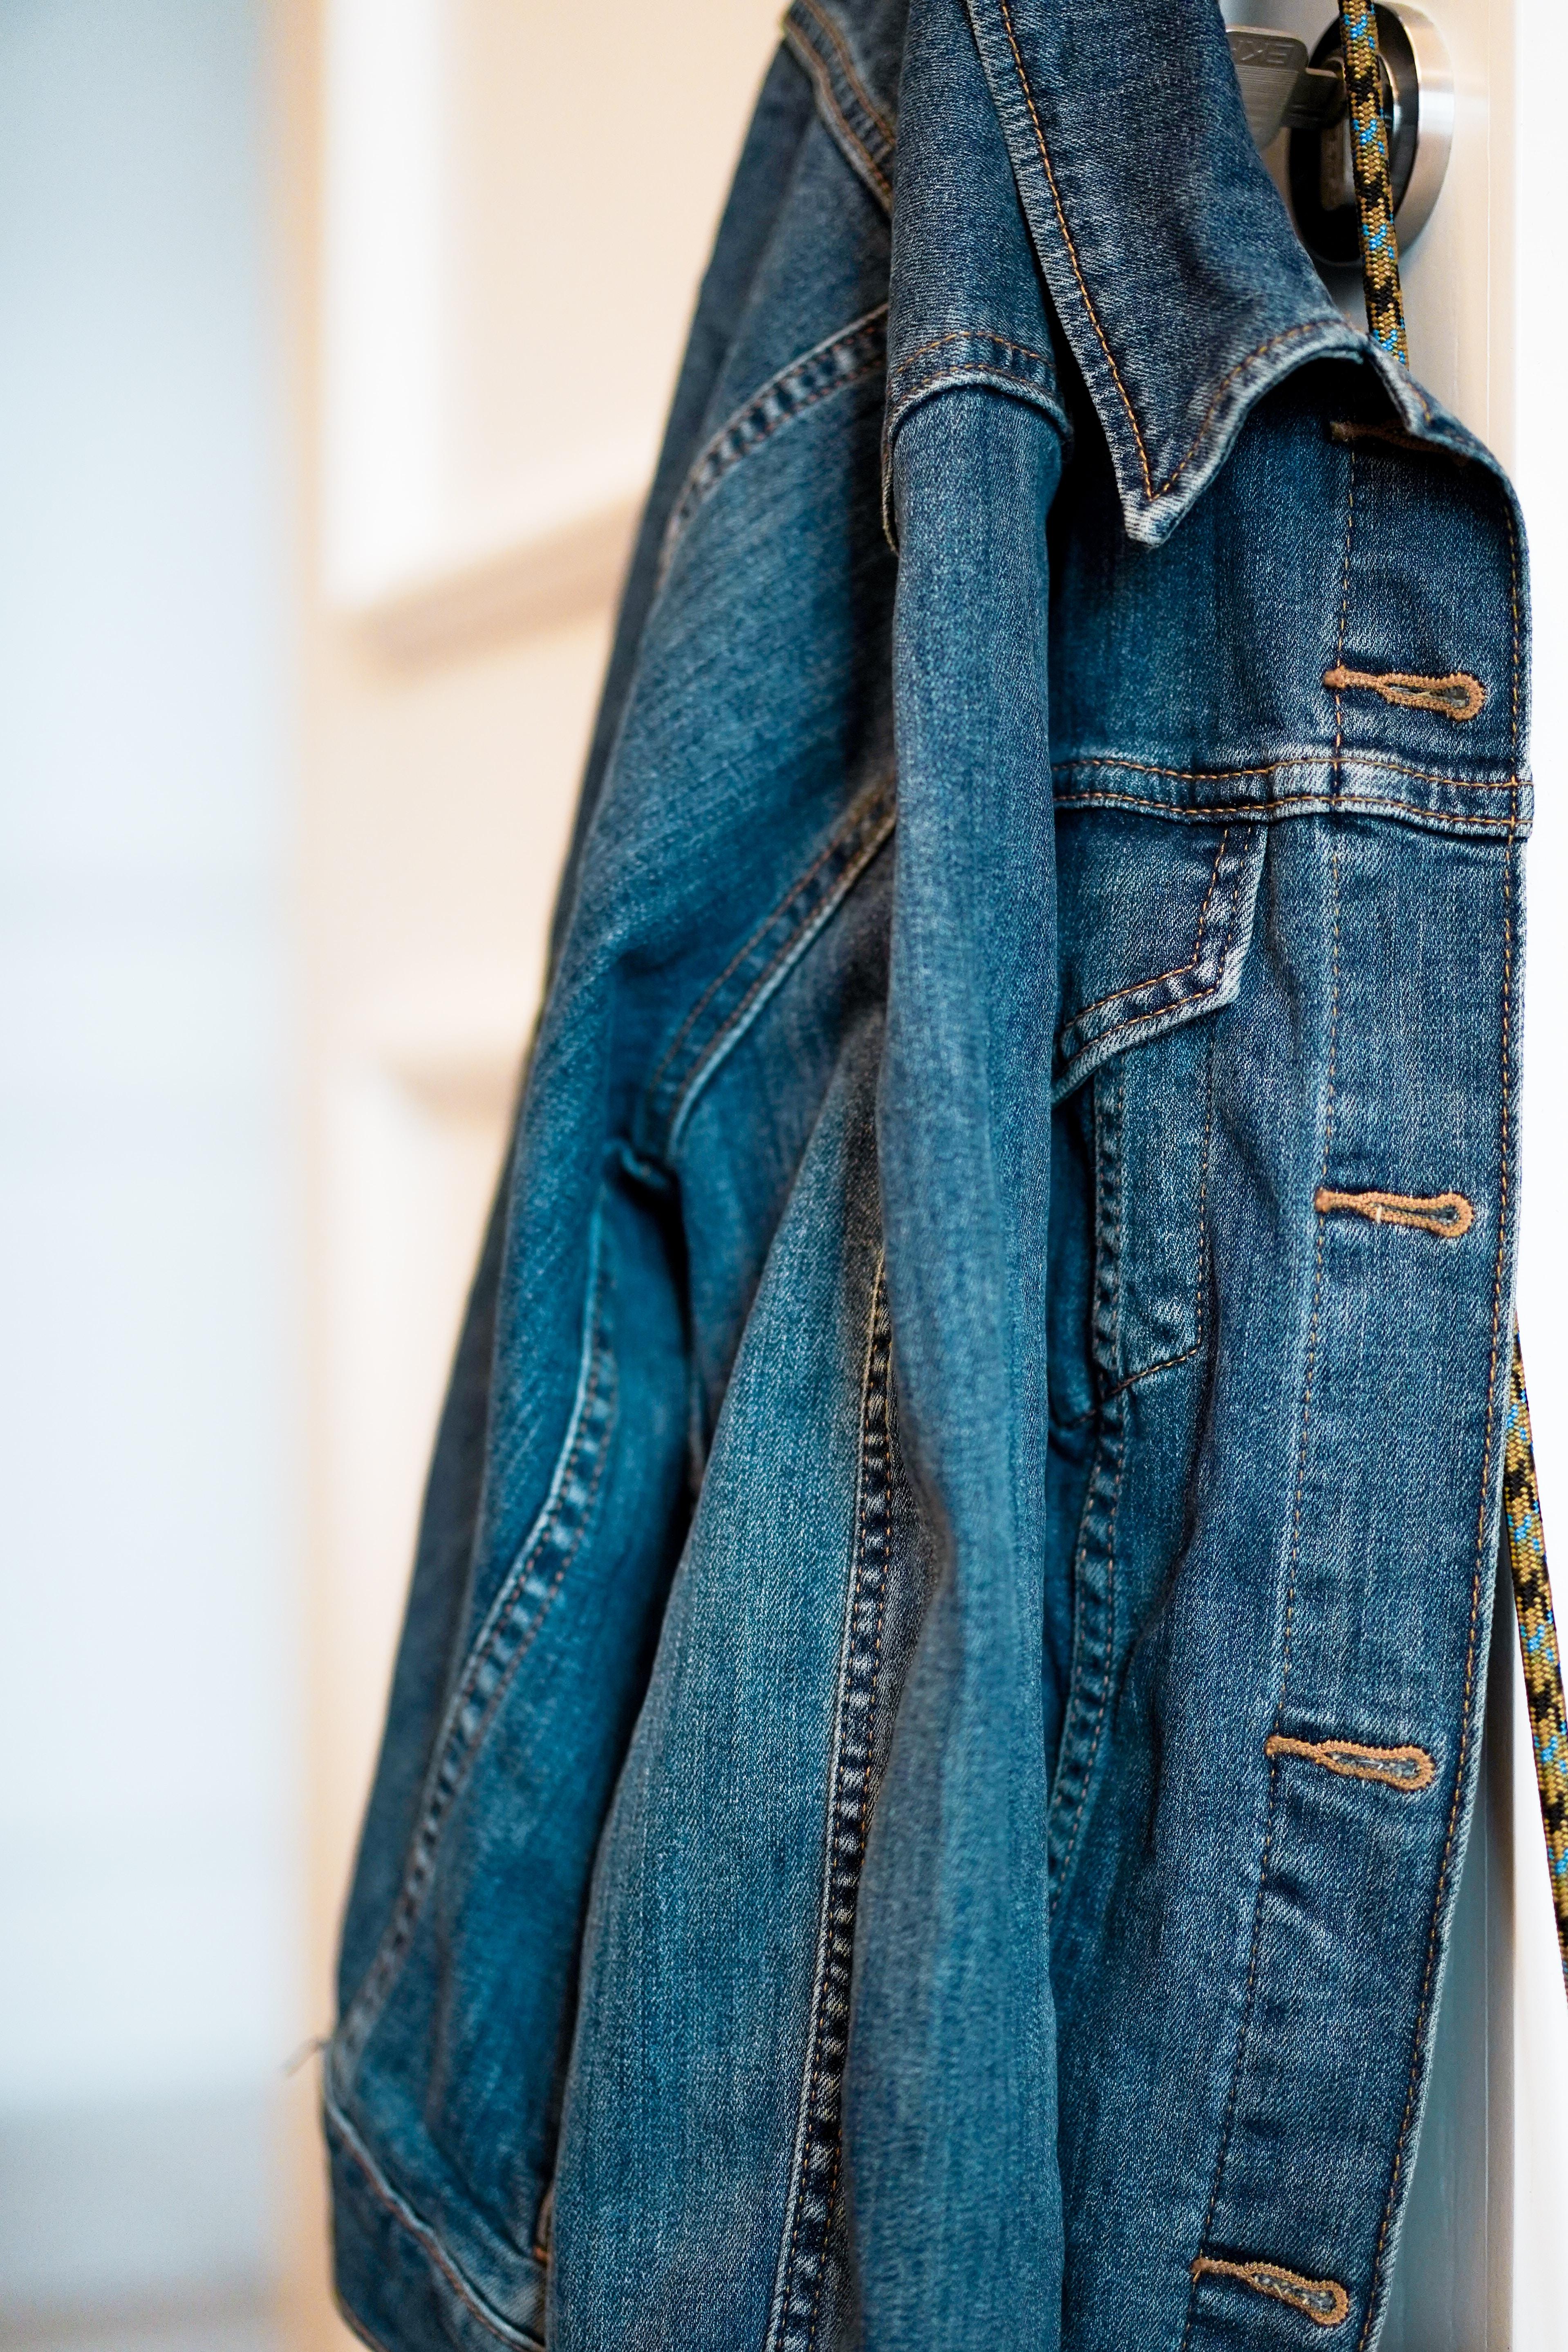 blue denim jacket hanging on wall